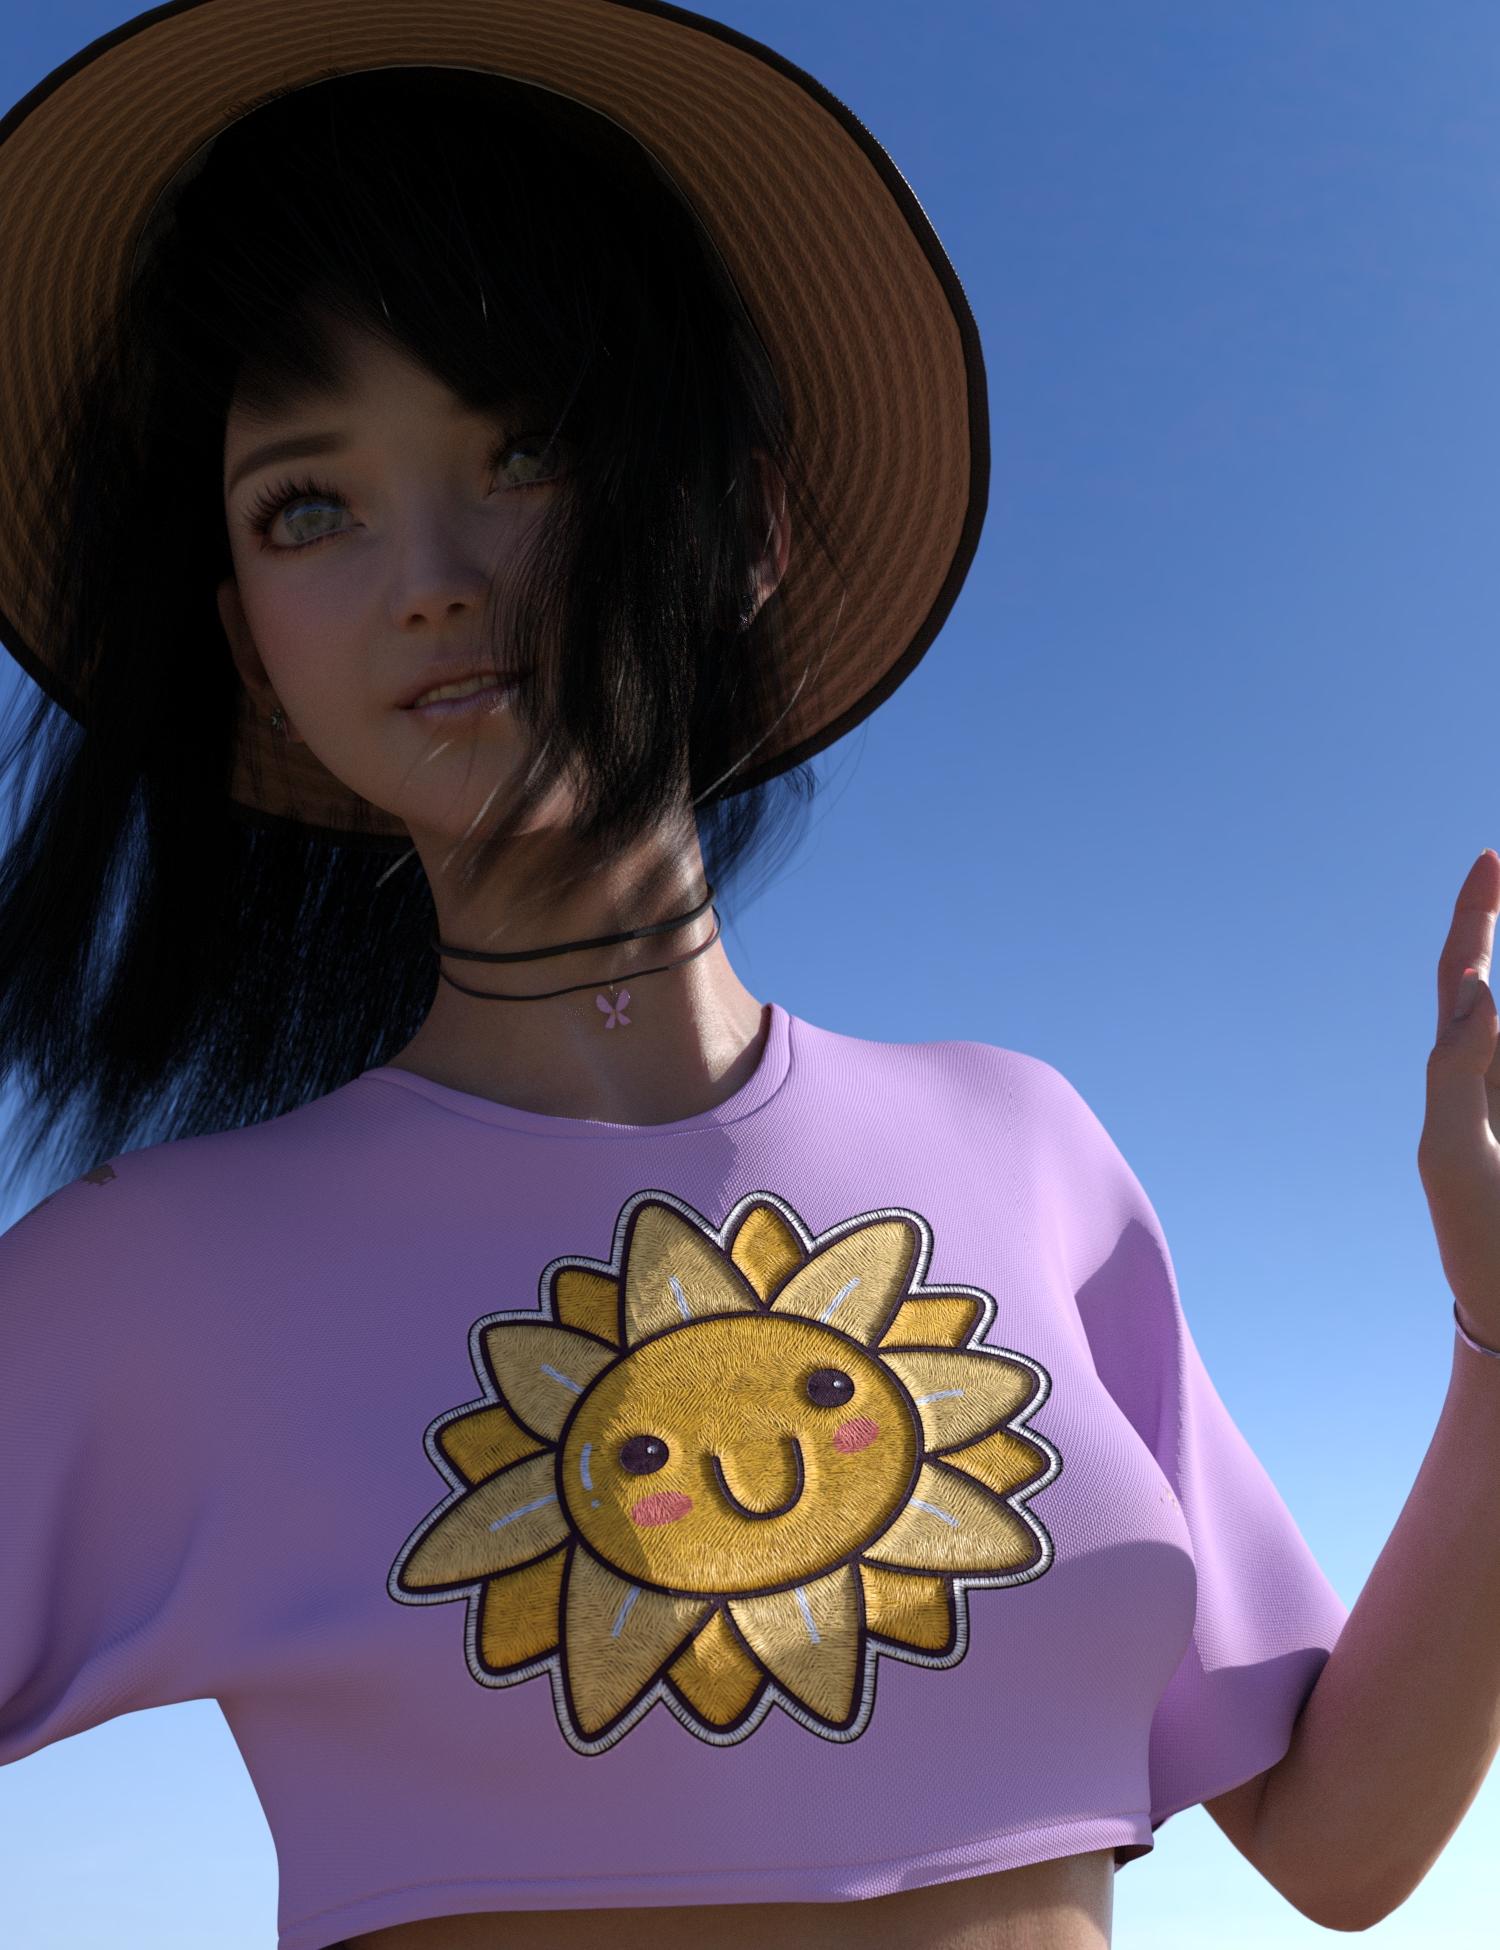 Merchant Resource: Fashion Patch 2 by: Sade, 3D Models by Daz 3D